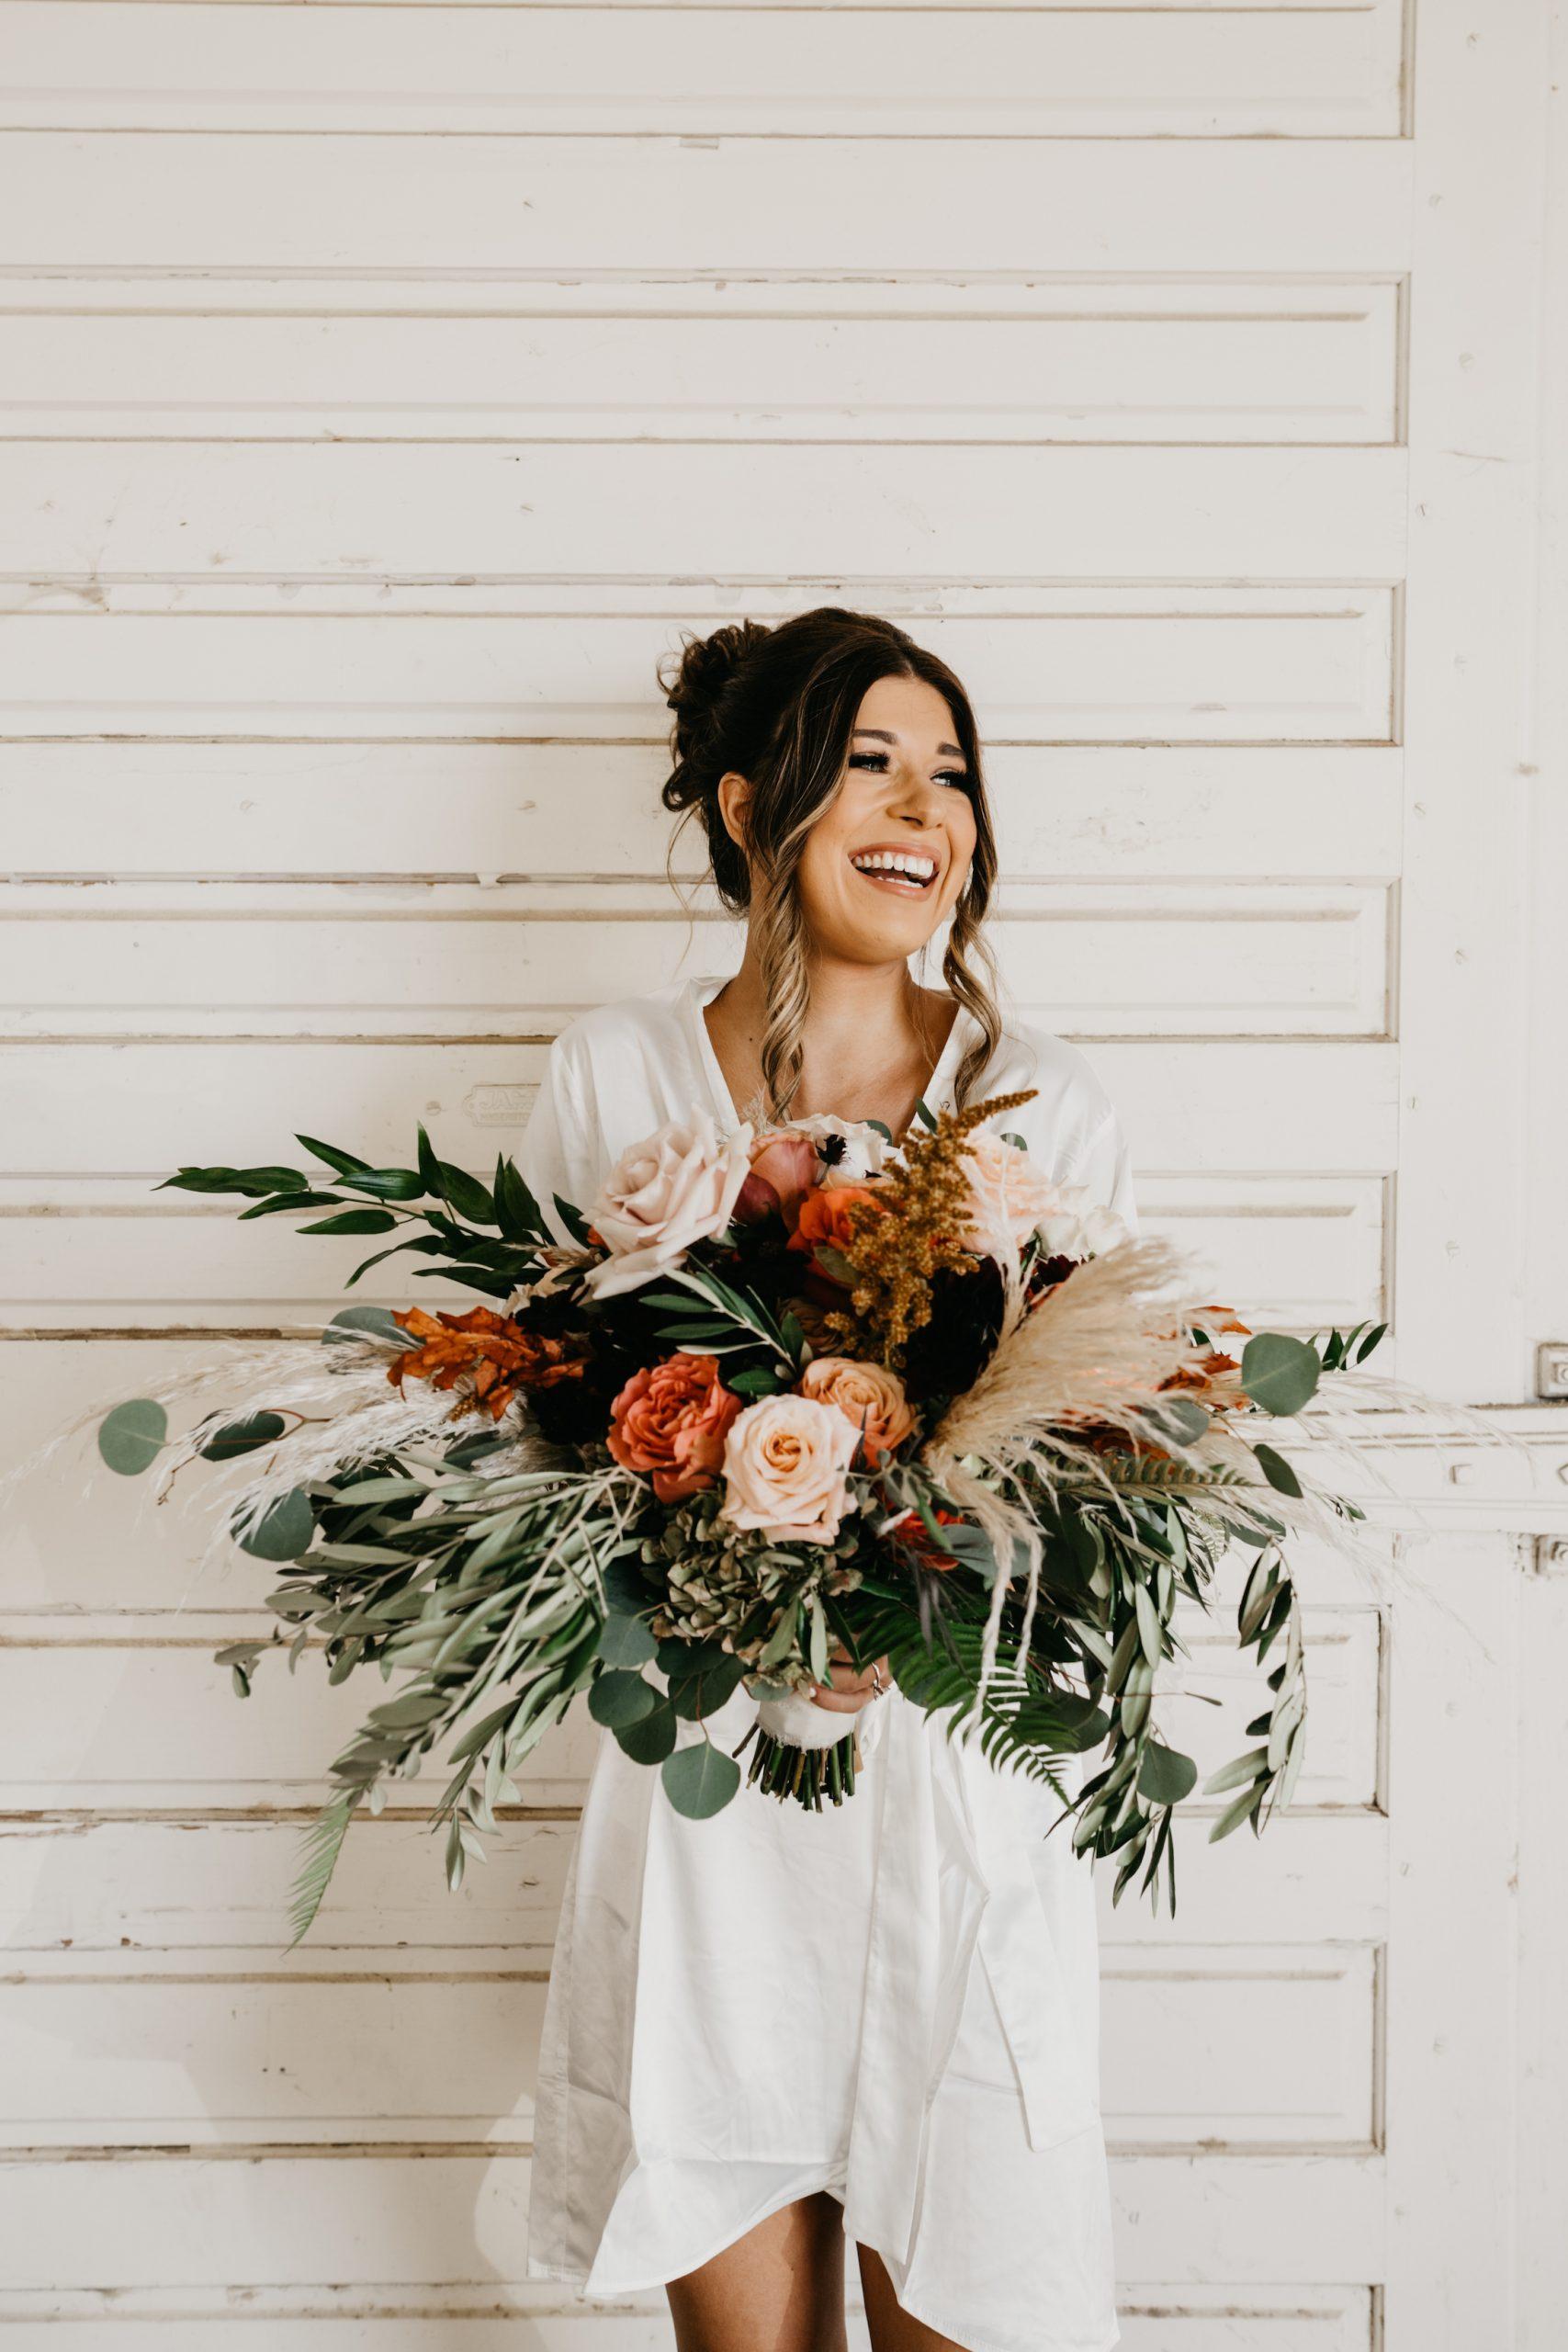 Bride and bridal bouquet, image by Fatima Elreda Photo